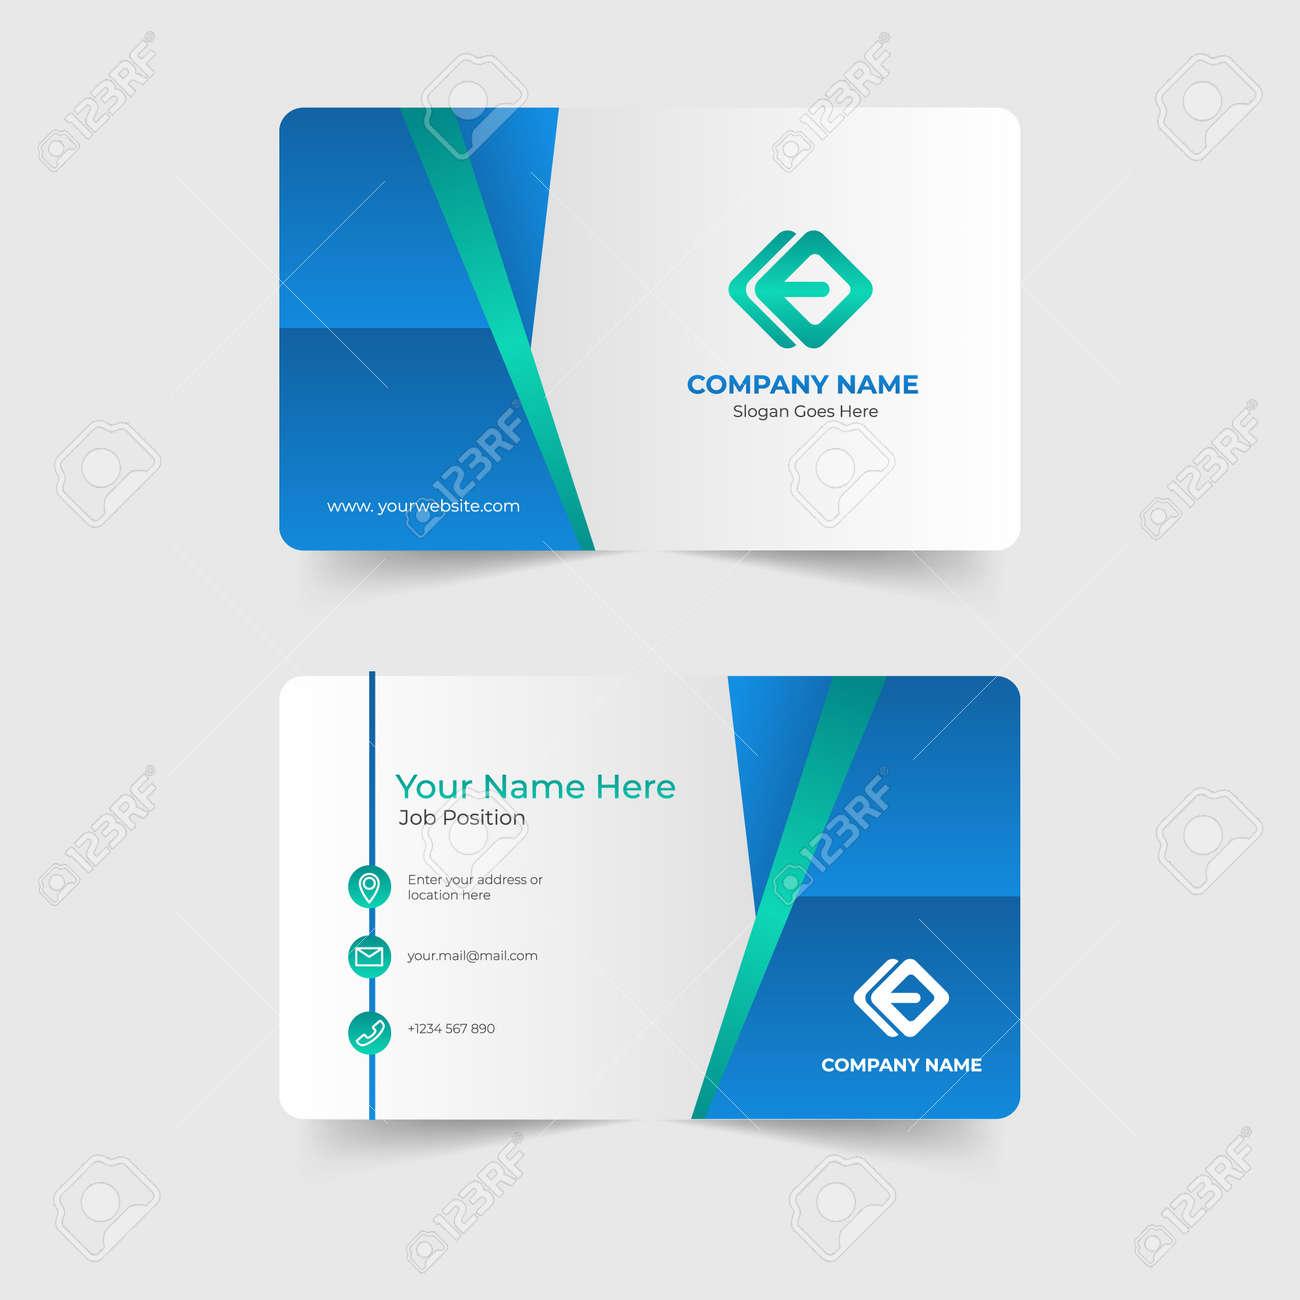 Corporate modern business card template - 168557593